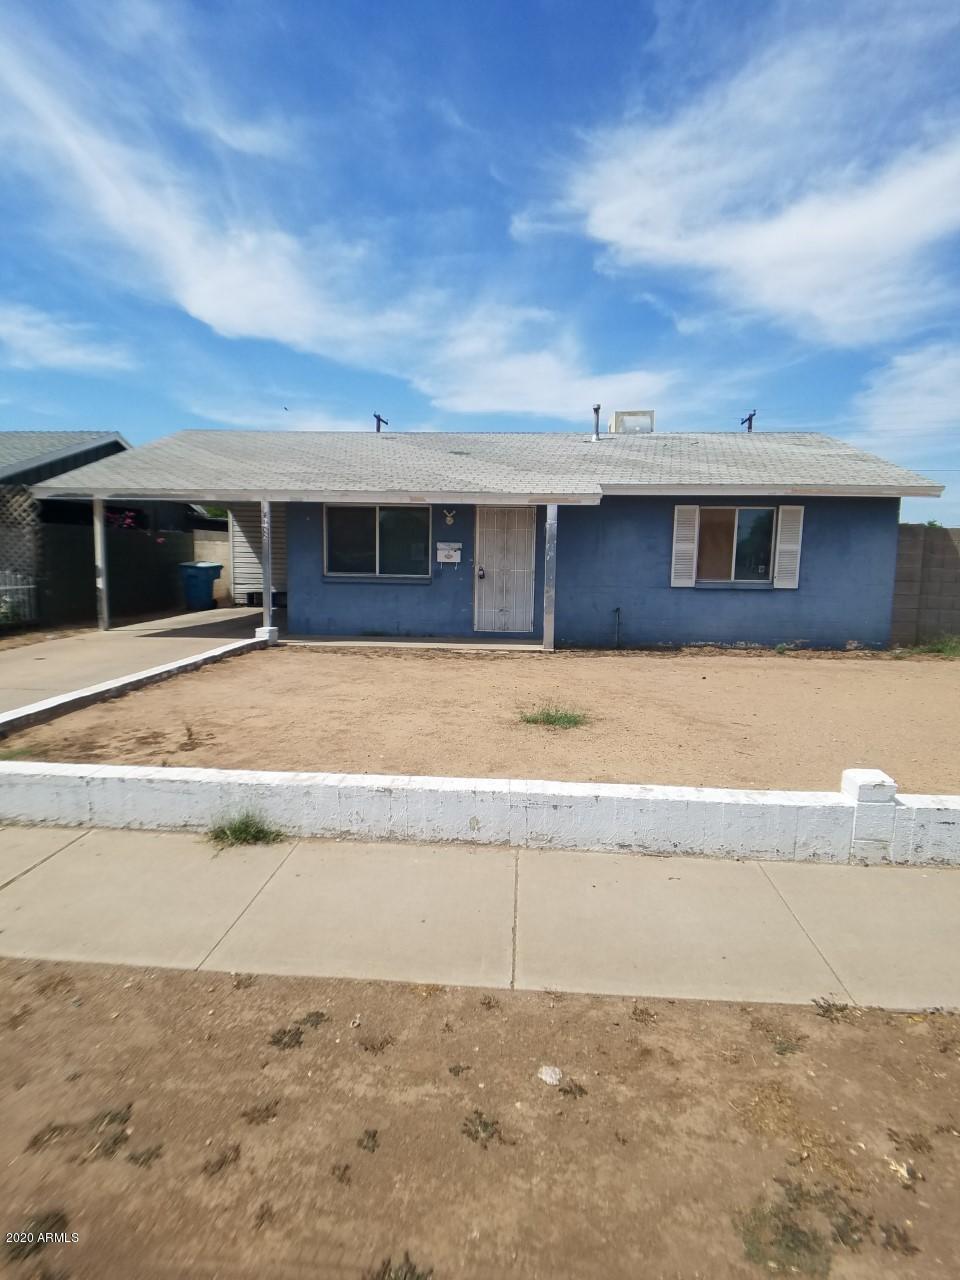 MLS 6067429 Phoenix Metro Area, Phoenix, AZ 85019 Affordable Homes in Phoenix